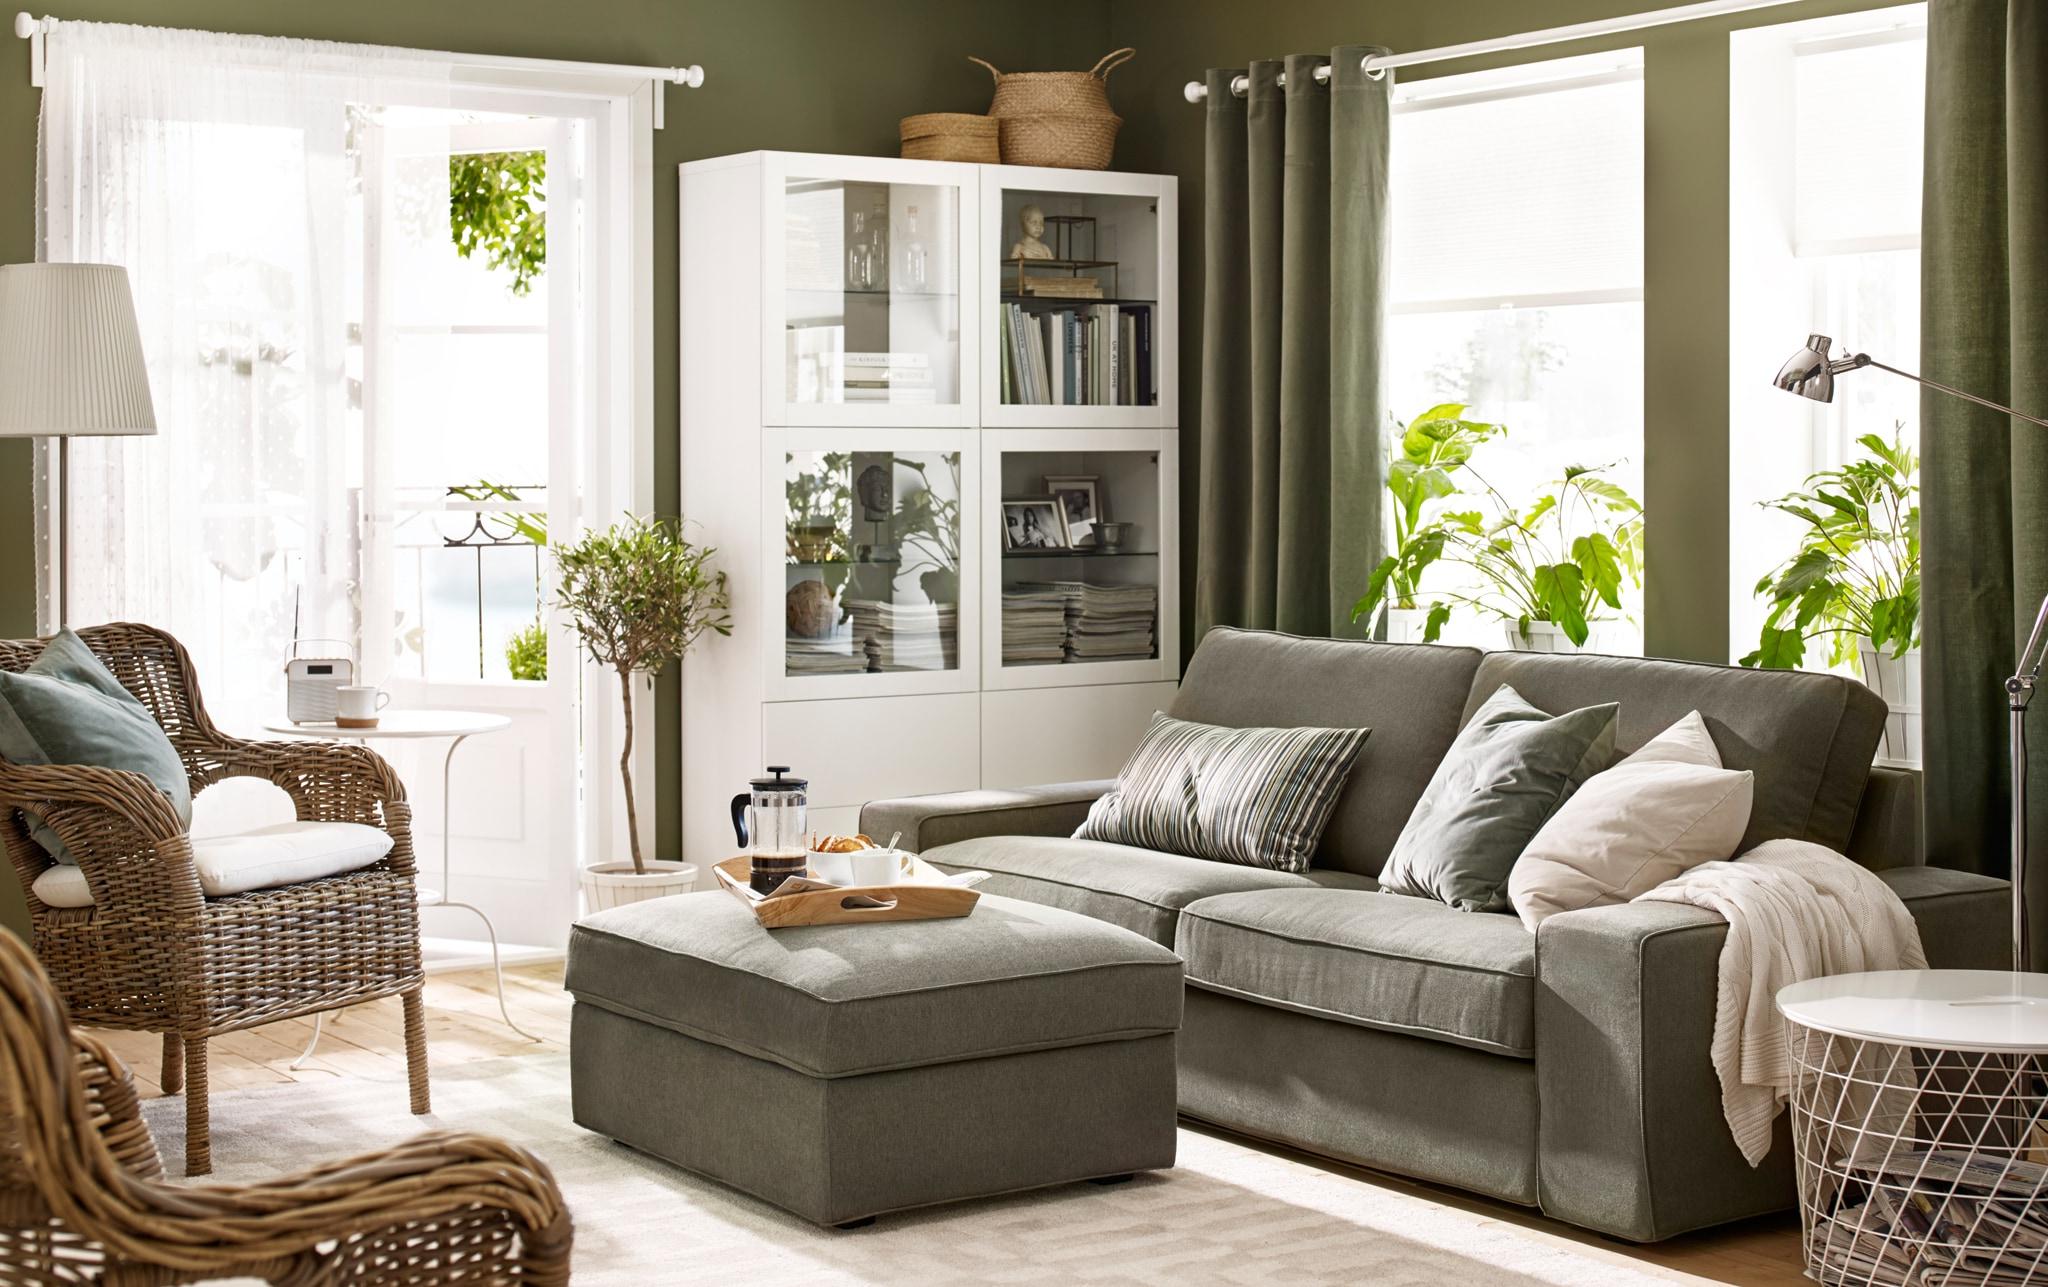 Muebles De Salon Ikea Ofertas Dddy Salà N Muebles Para El Salà N Pra Online Ikea